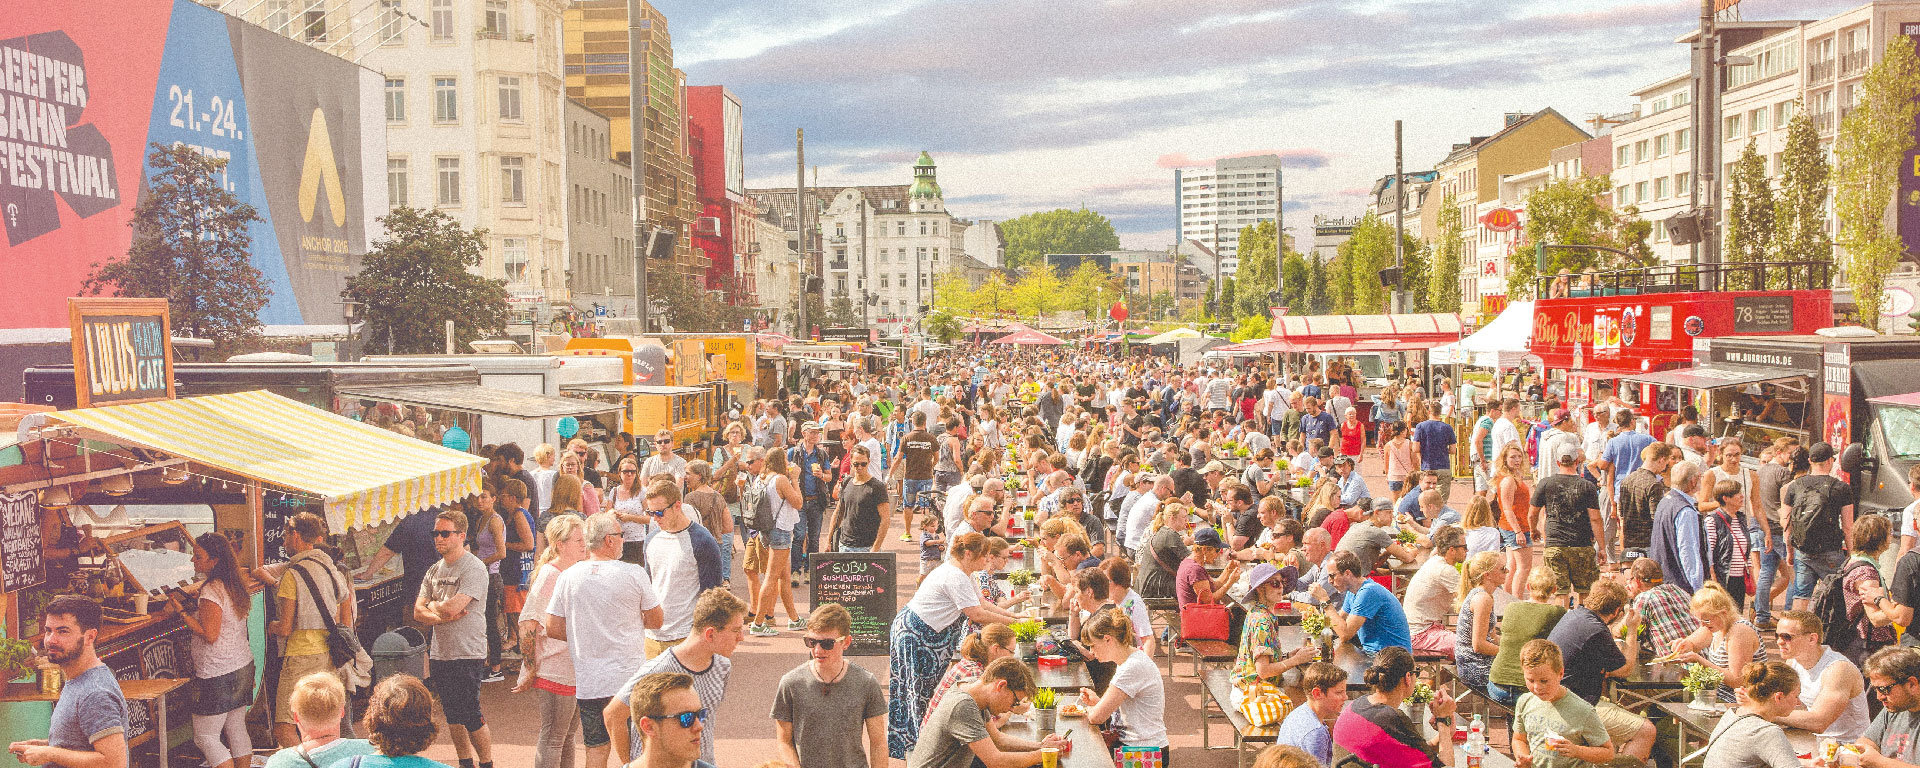 Food Truck Festival Hamburg St Pauli 17 05 21 05 2018